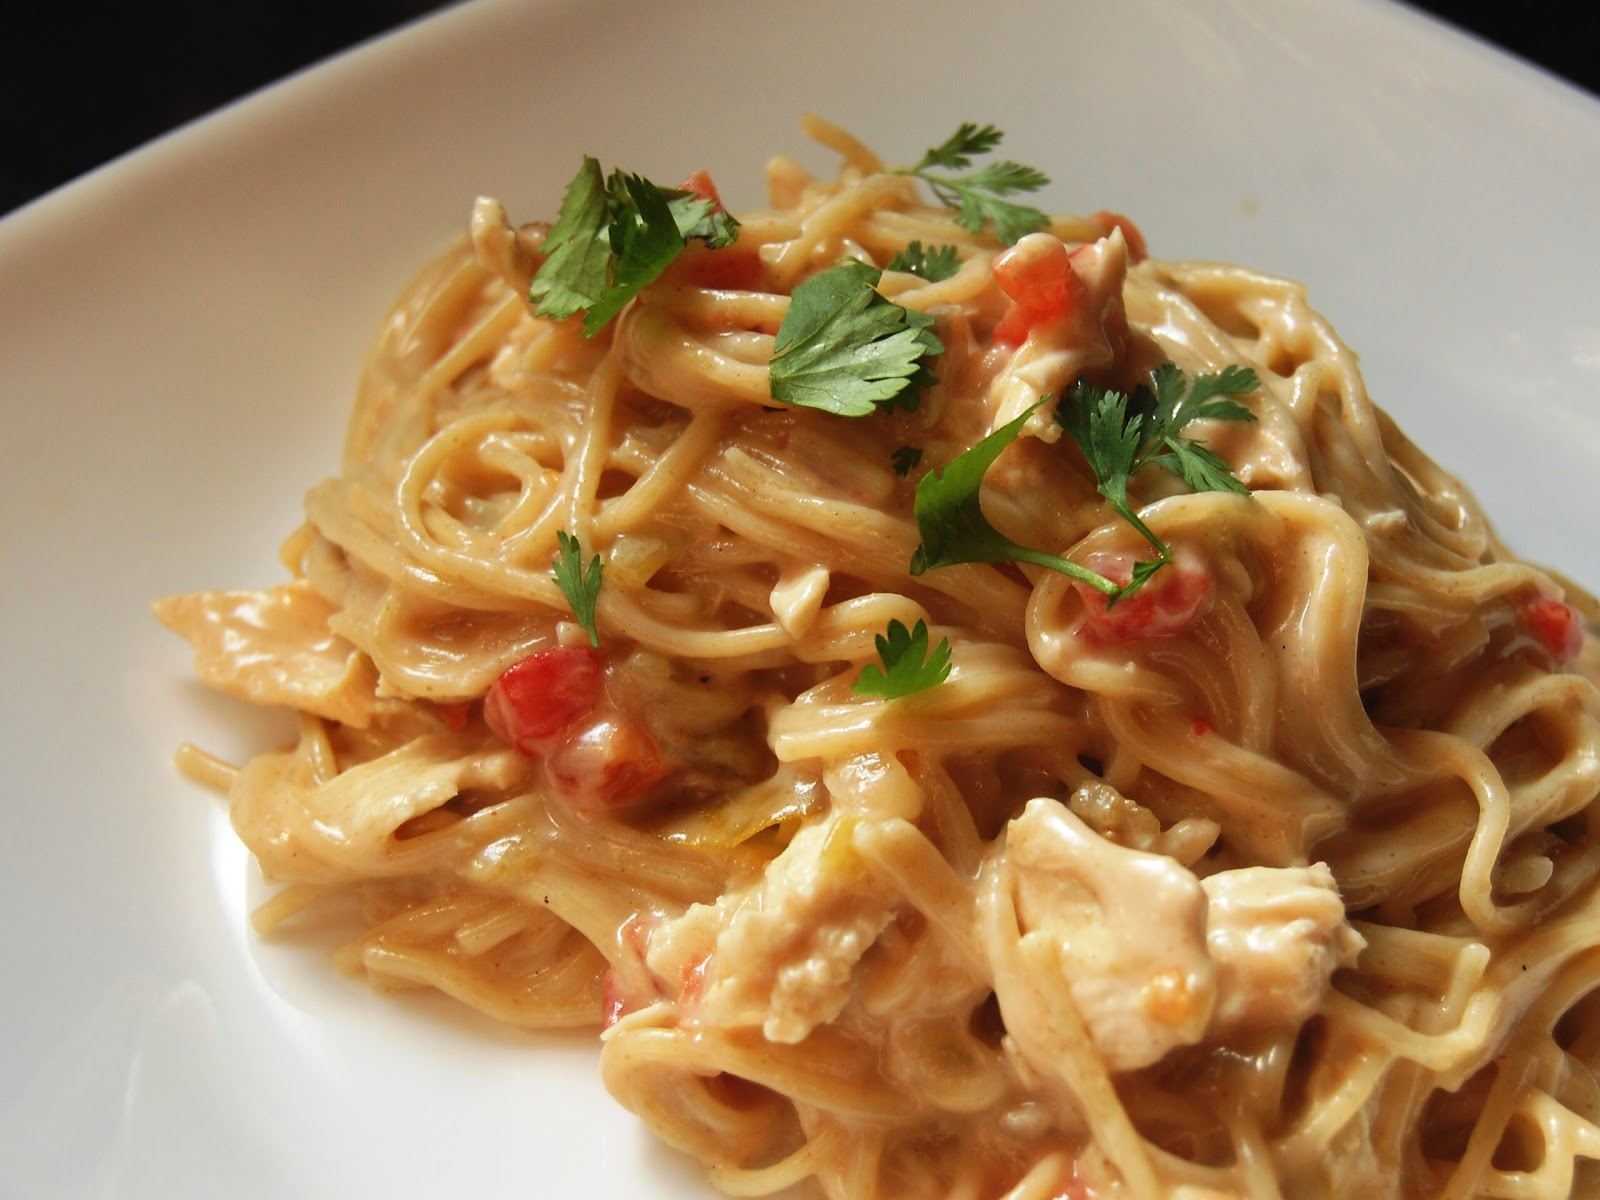 Cassie Craves: Tex-Mex White Cheddar Chicken Spaghetti